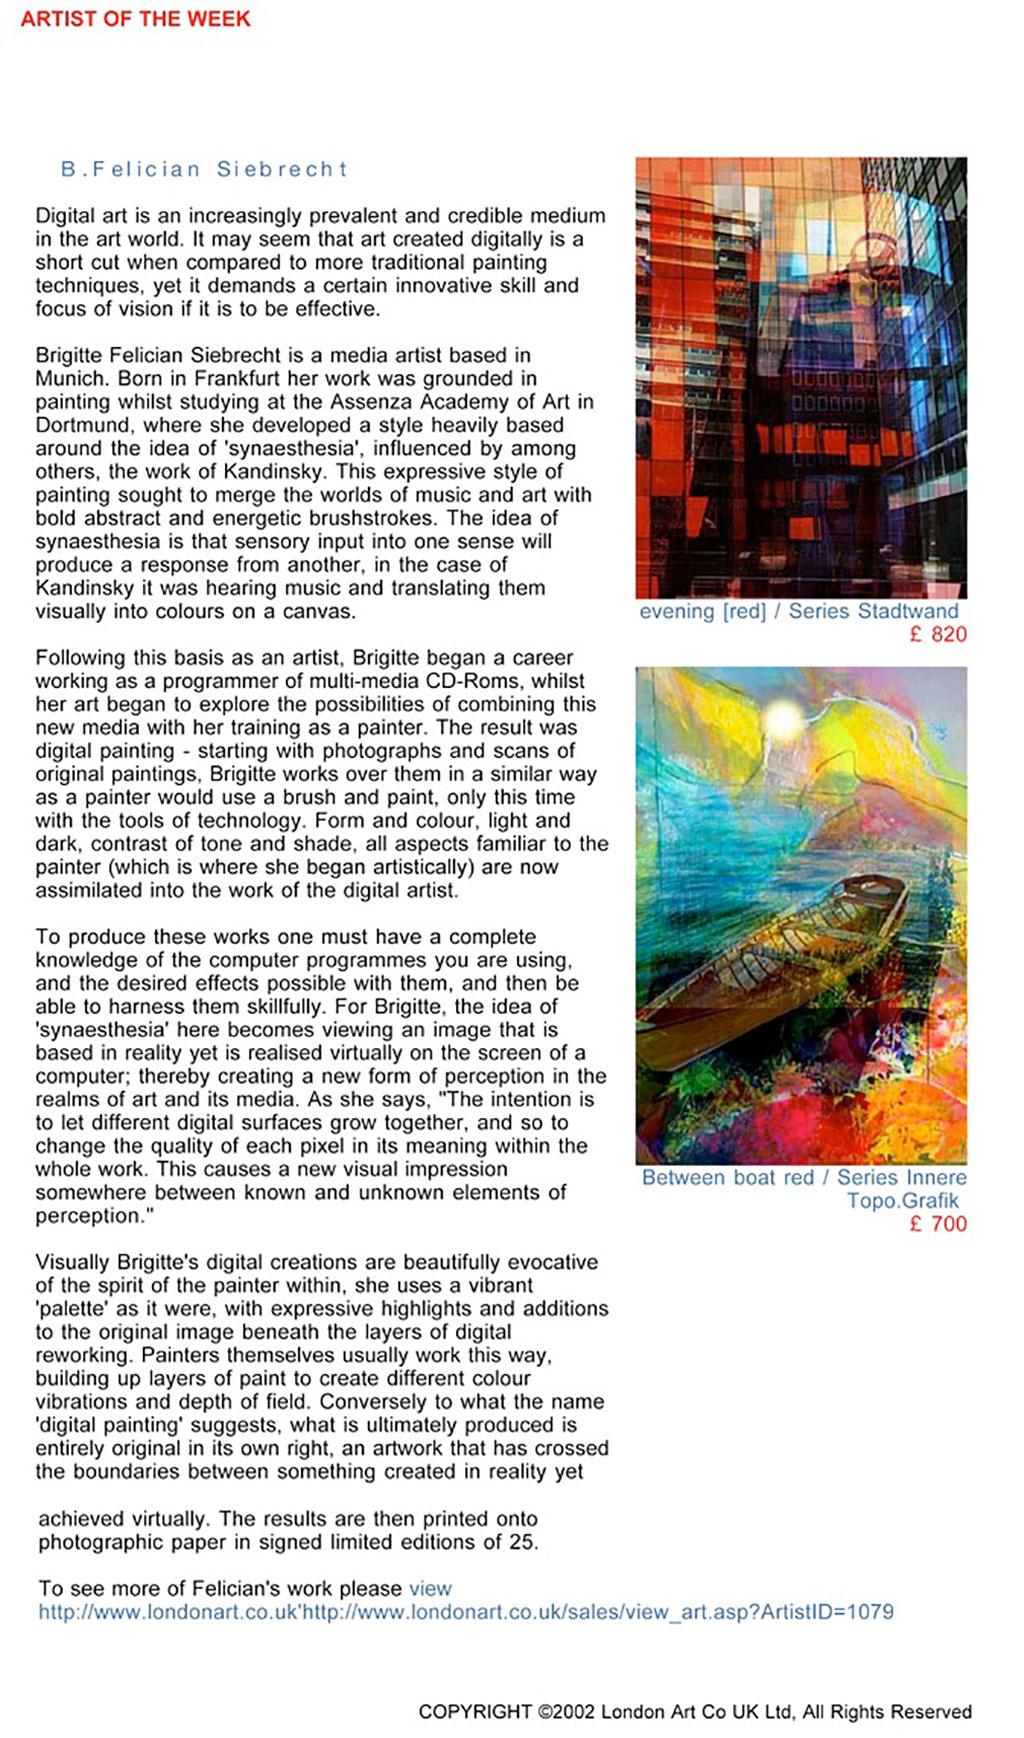 B.Felician Siebrecht is artist of the week at the LondonArt Gallery, LondonArt magazine, 27.11.2006